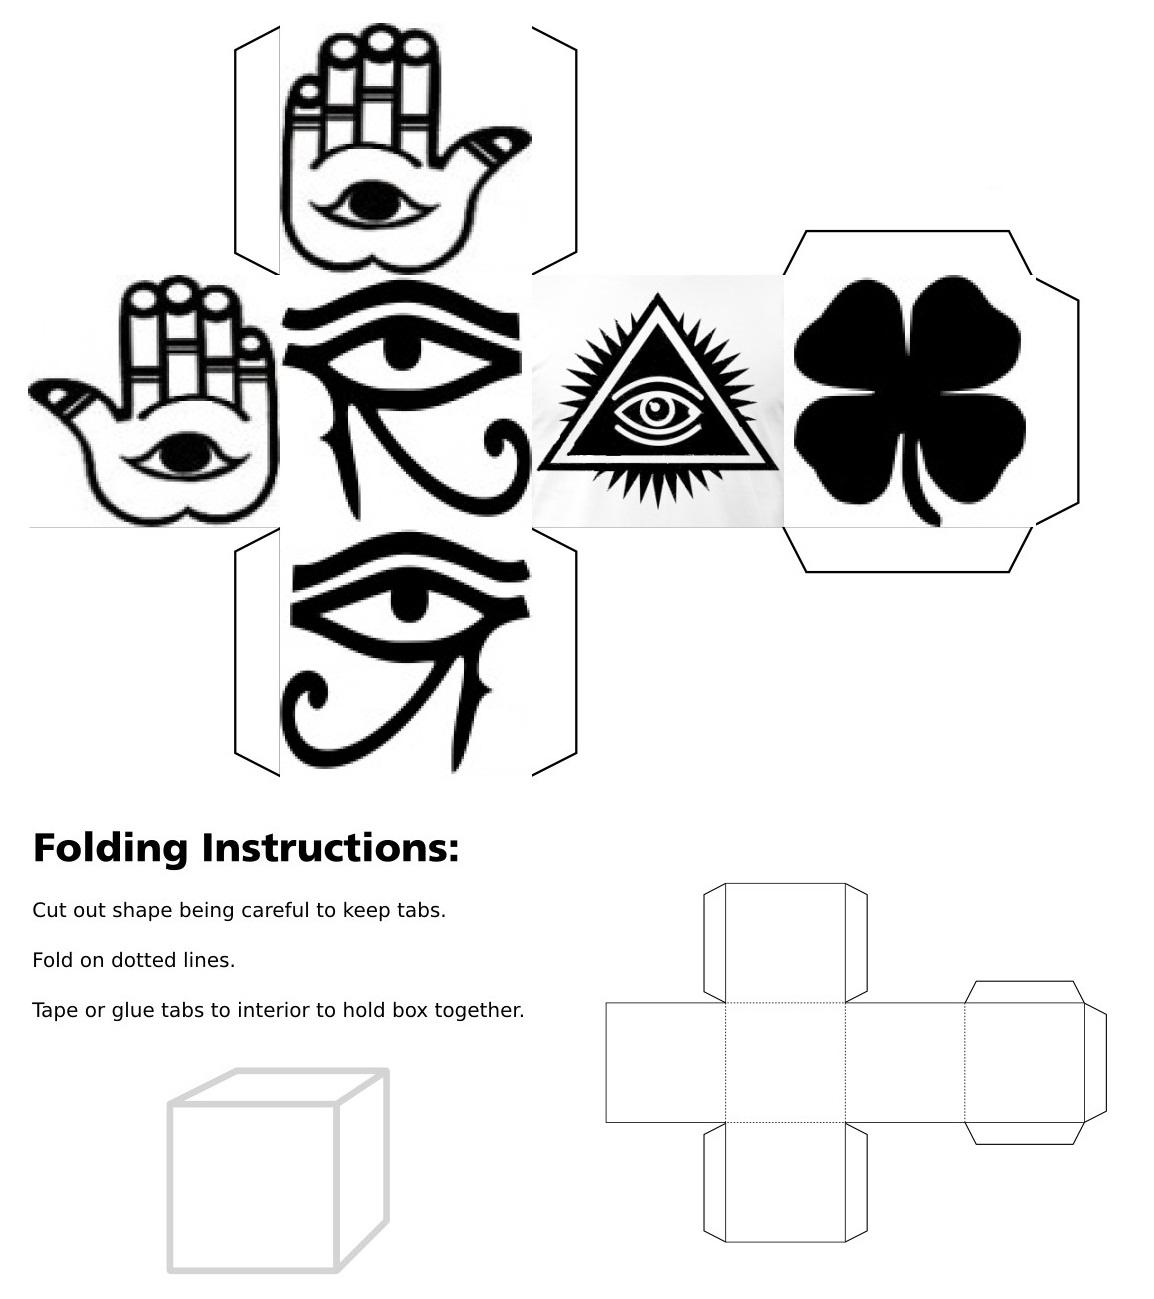 cube, 3d cube, lucky dice, luck symbols, Black Eye of Fatima, Black Eye of Providence, Black Four Leaf Clover, Black Horseshoe, Black Maneki Neko, Black Om, Black Ying Yang